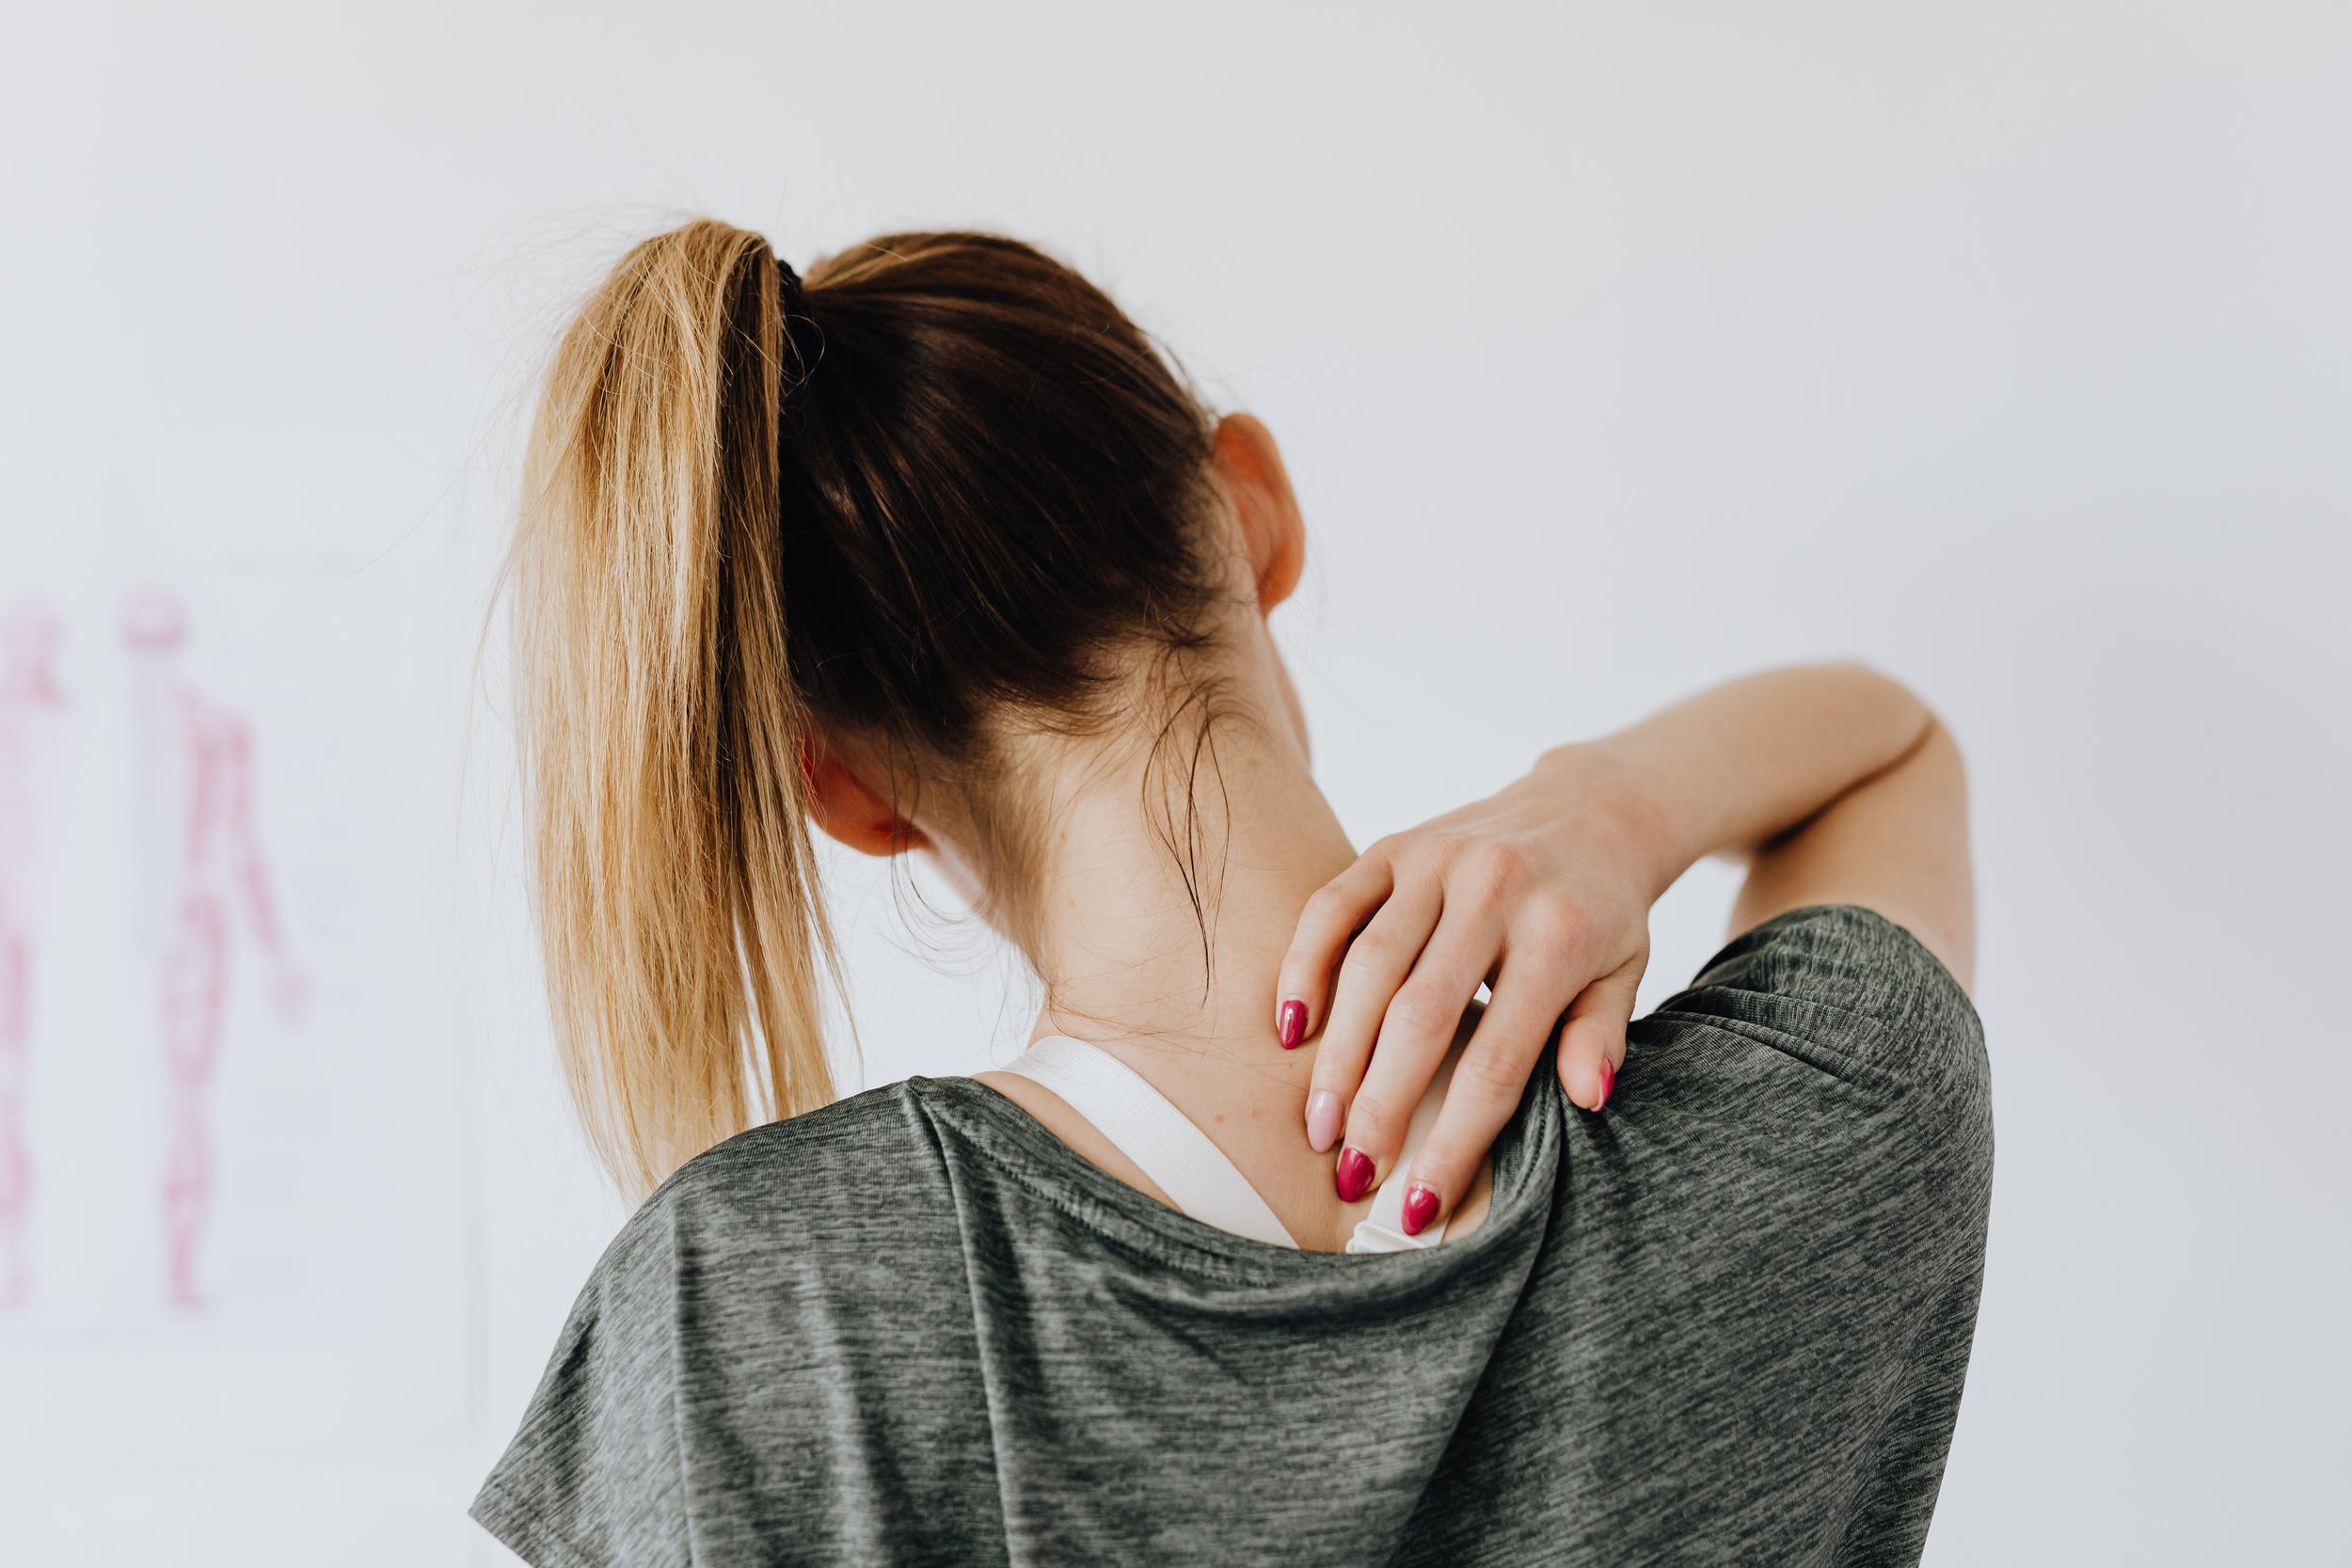 Use corrective wellness chiropractic care for treating fibromyalgia.